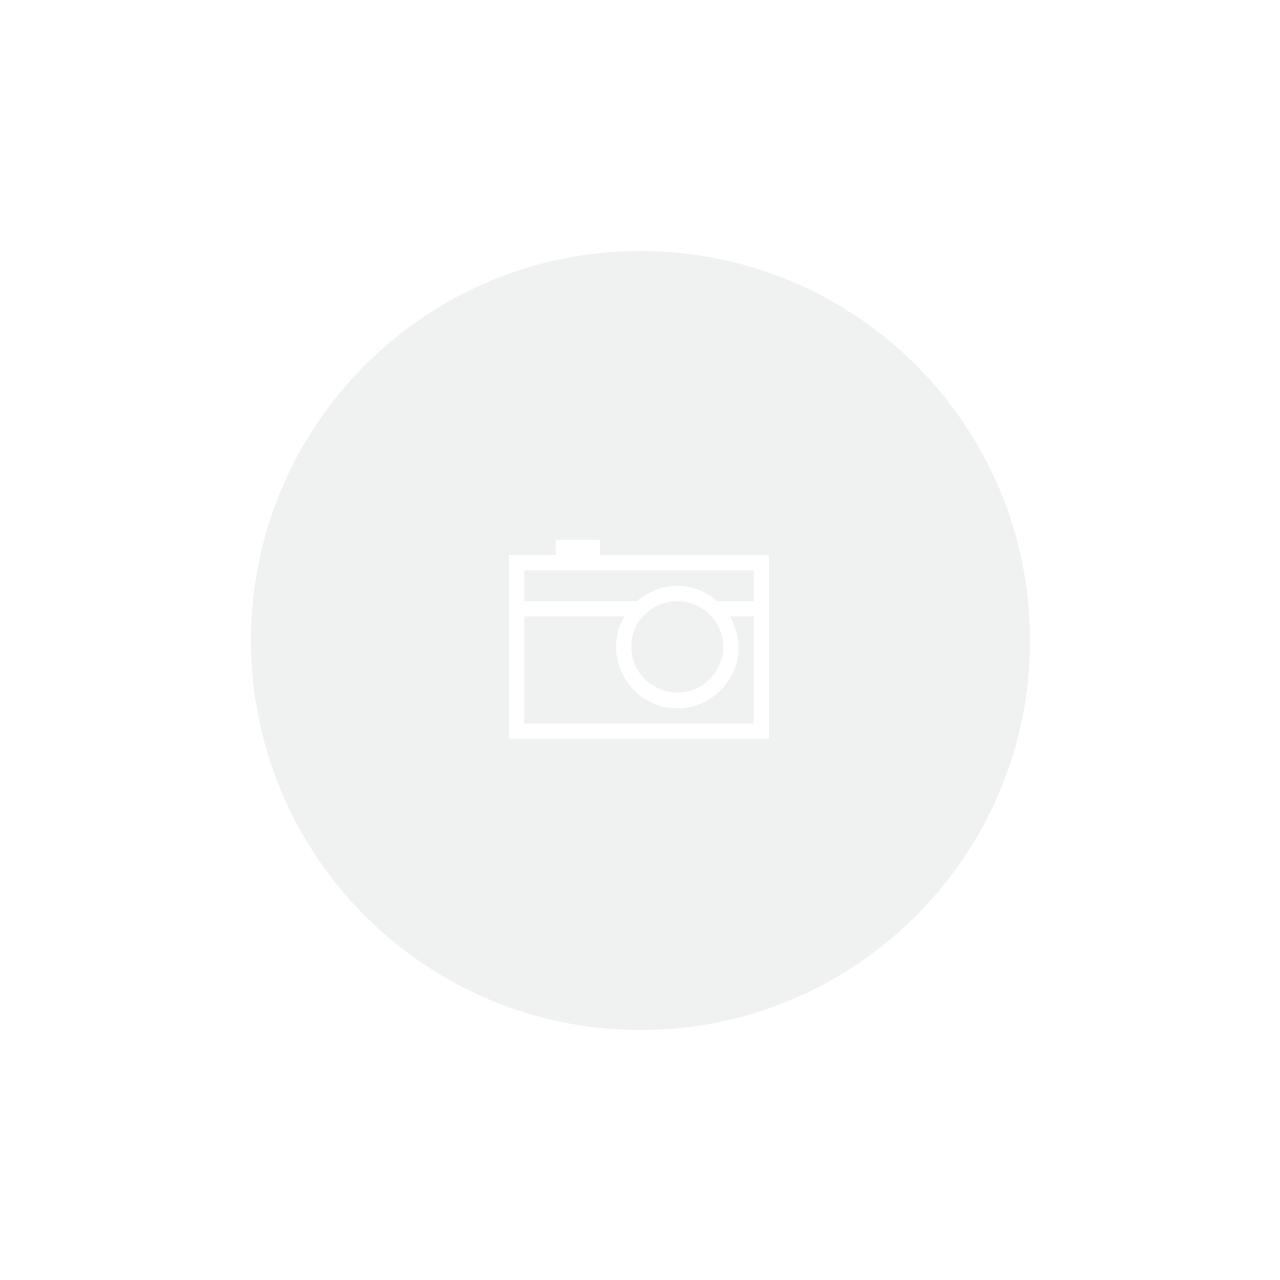 Pegador Multiuso 30 cm em Silicone Apreciatta Tramontina